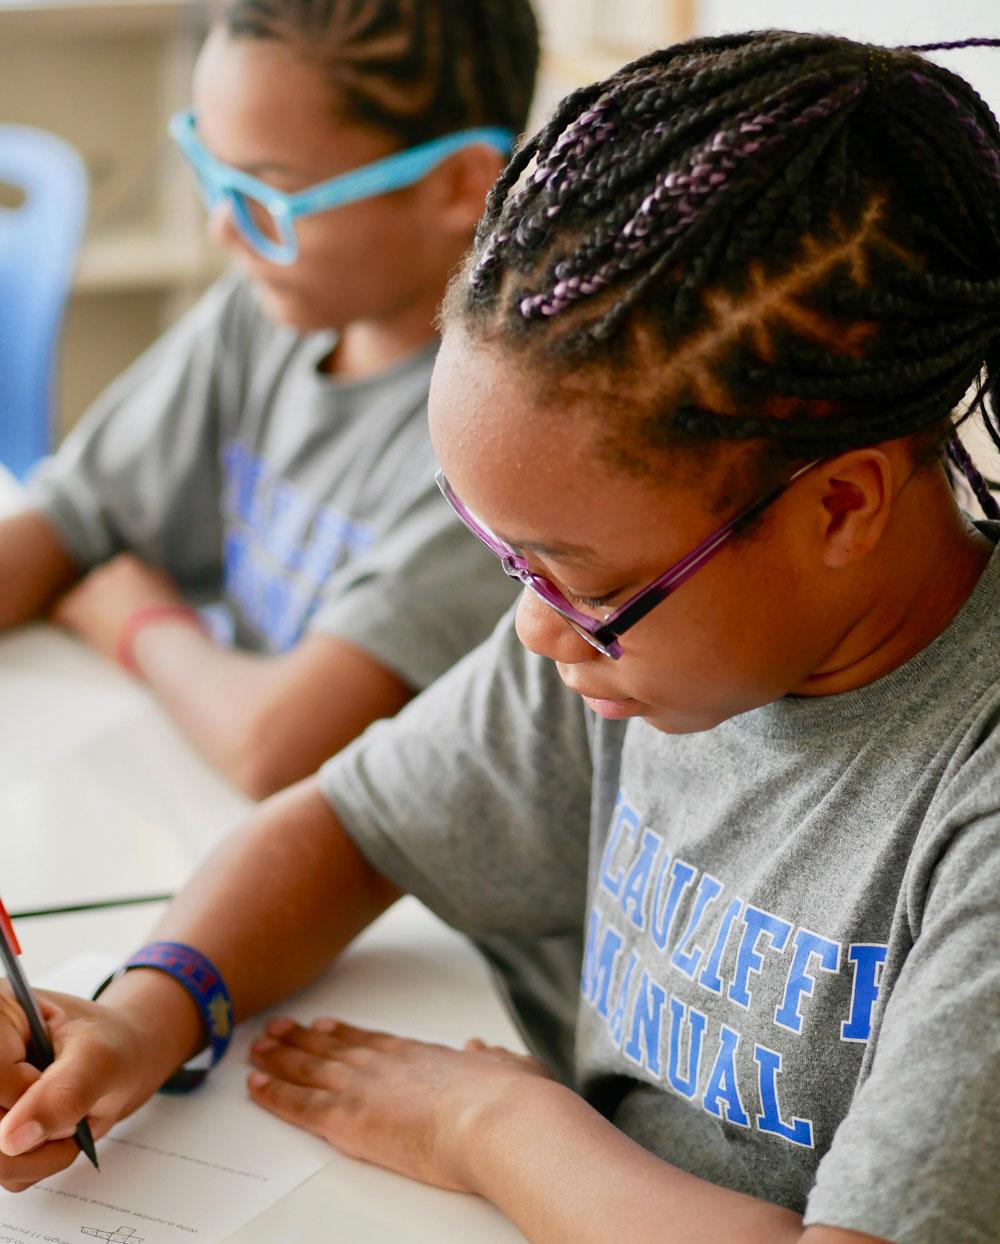 Two girls wearing glasses writing